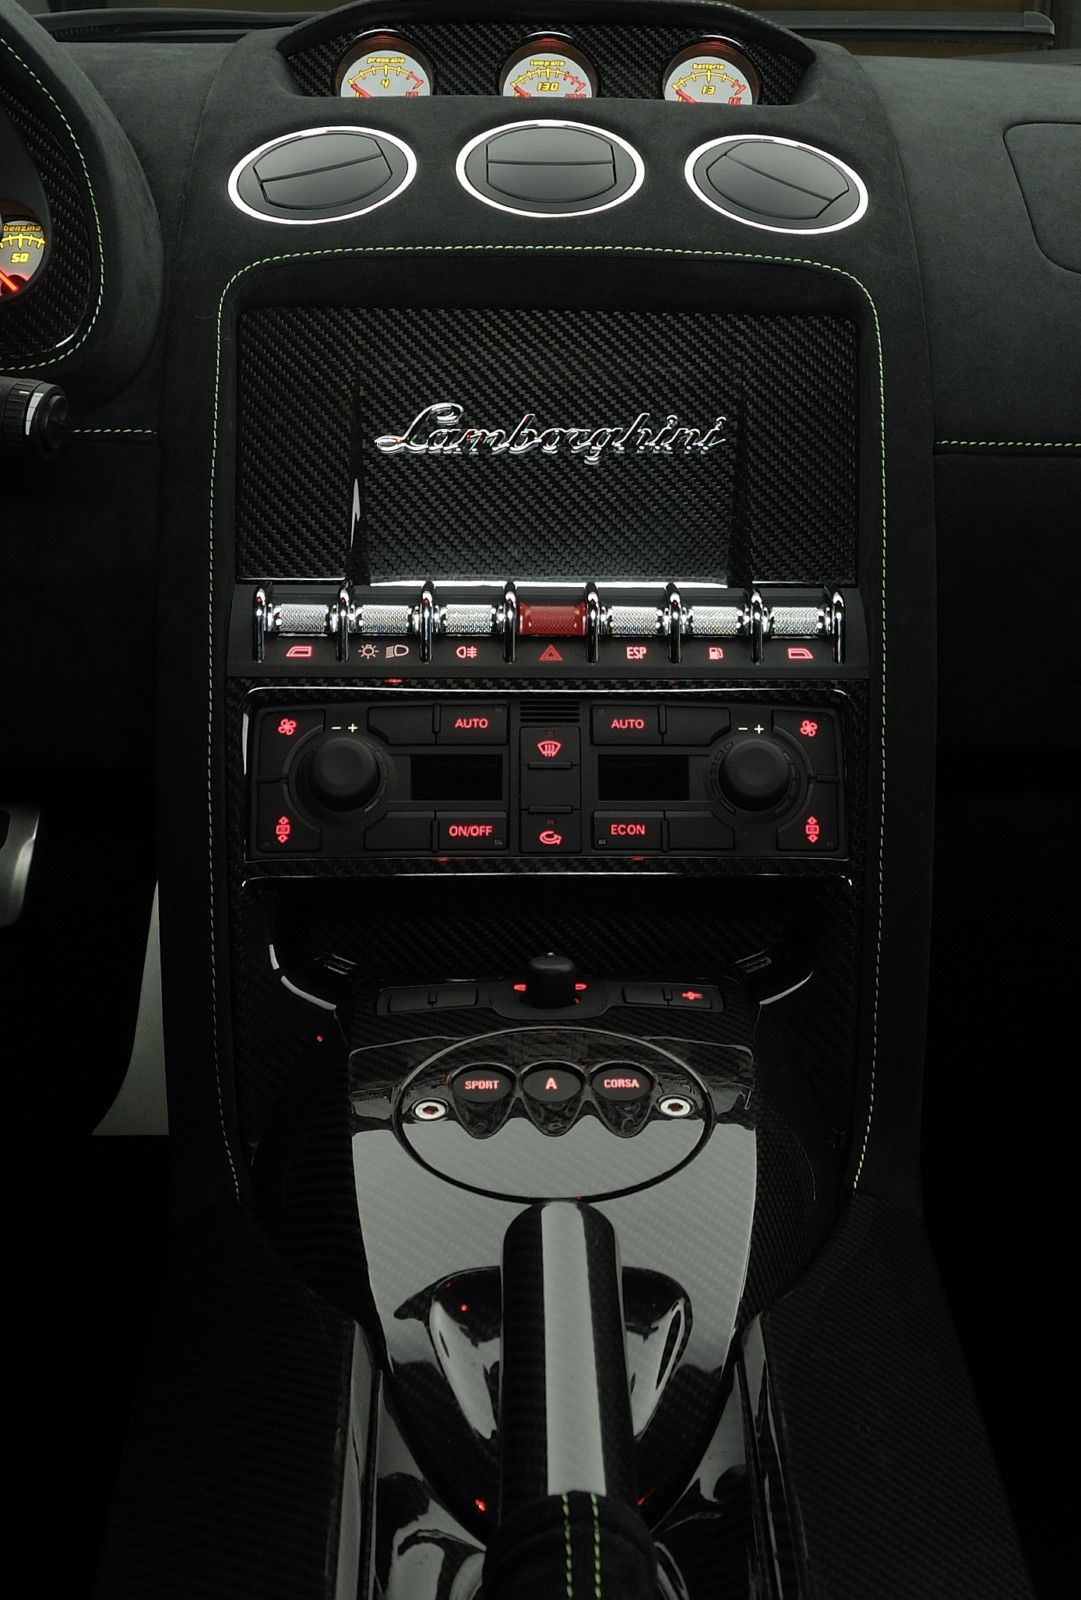 2010 Geneva Motor Show Gallardo LP 5704